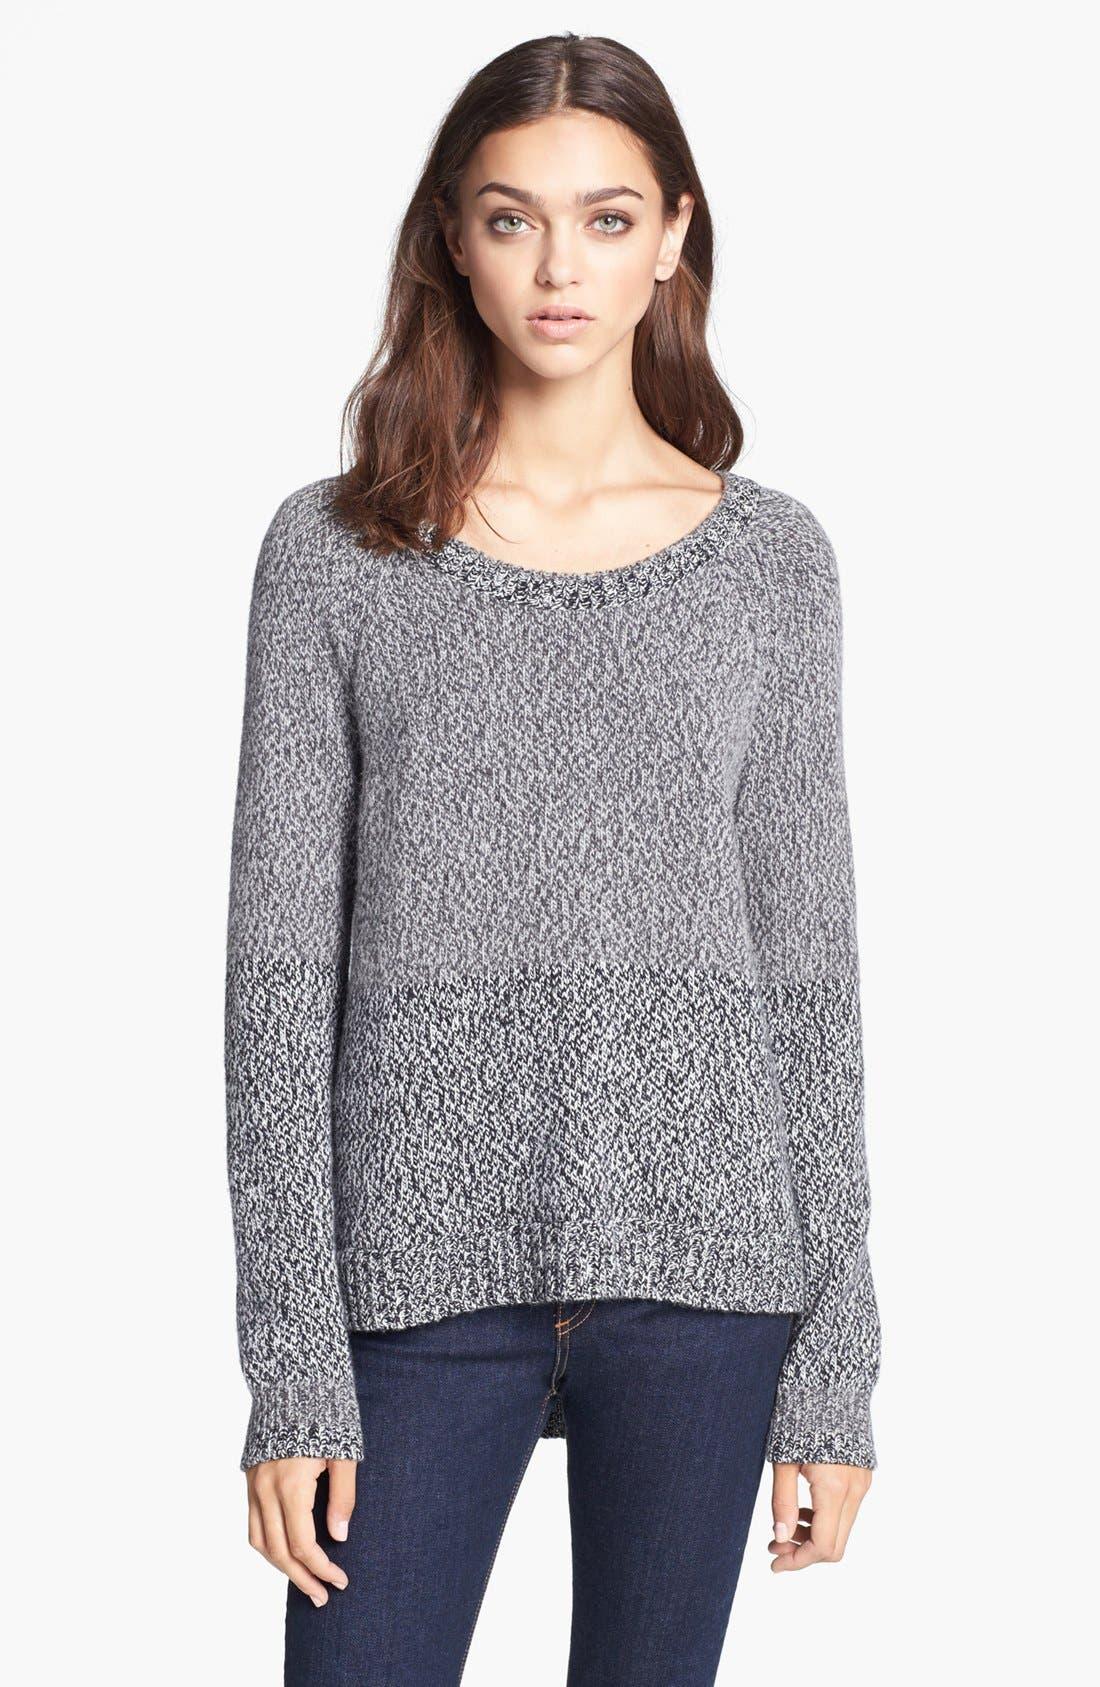 Alternate Image 1 Selected - rag & bone 'Claire' Sweater